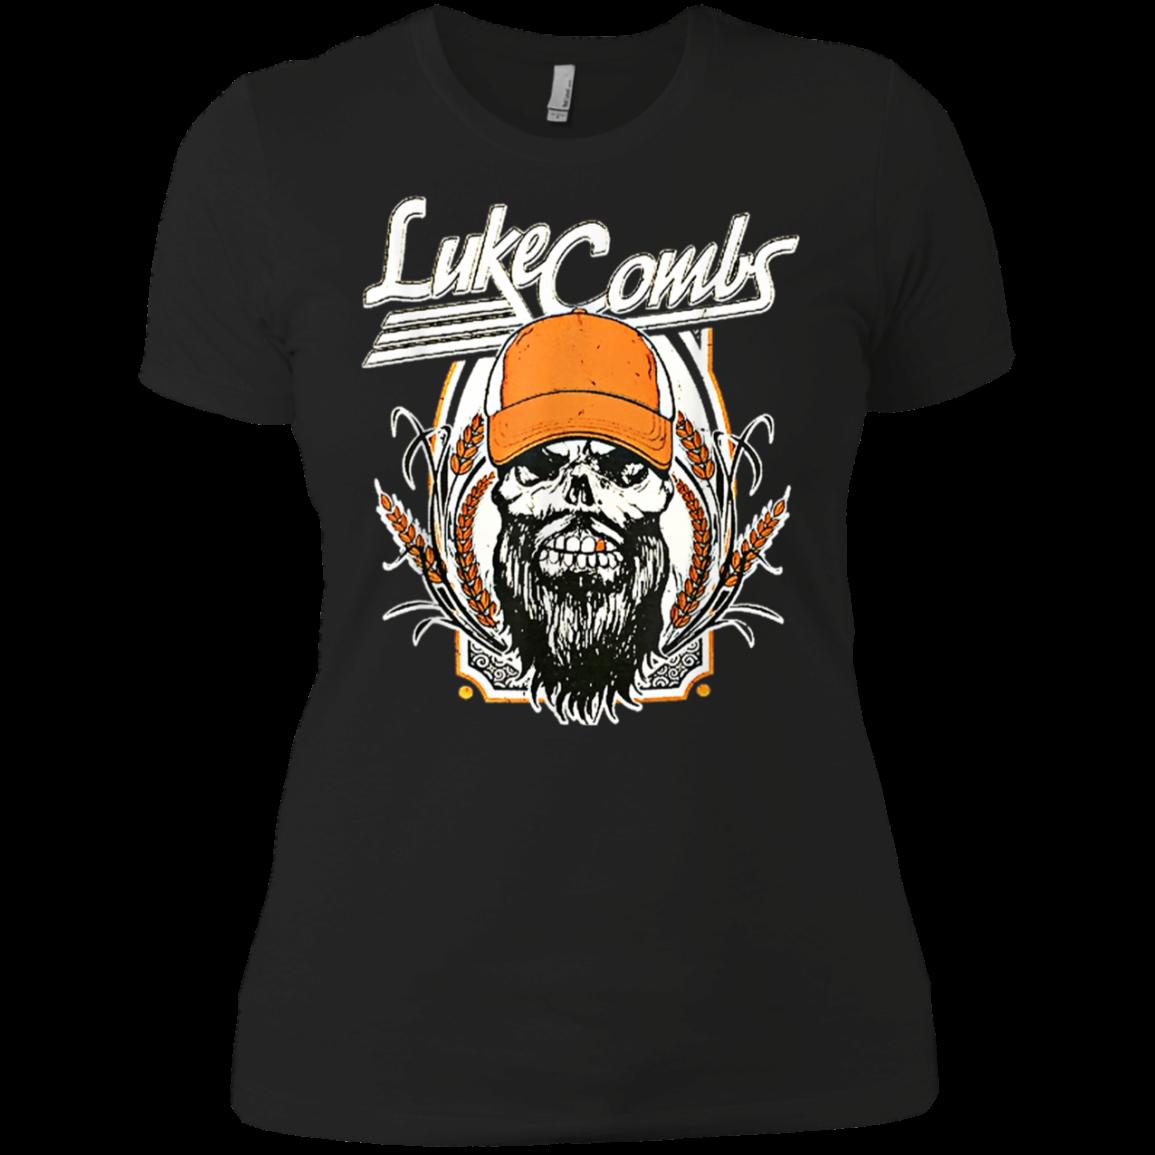 One Number Luke Away Combs Cool shirt Ladies' Boyfriend